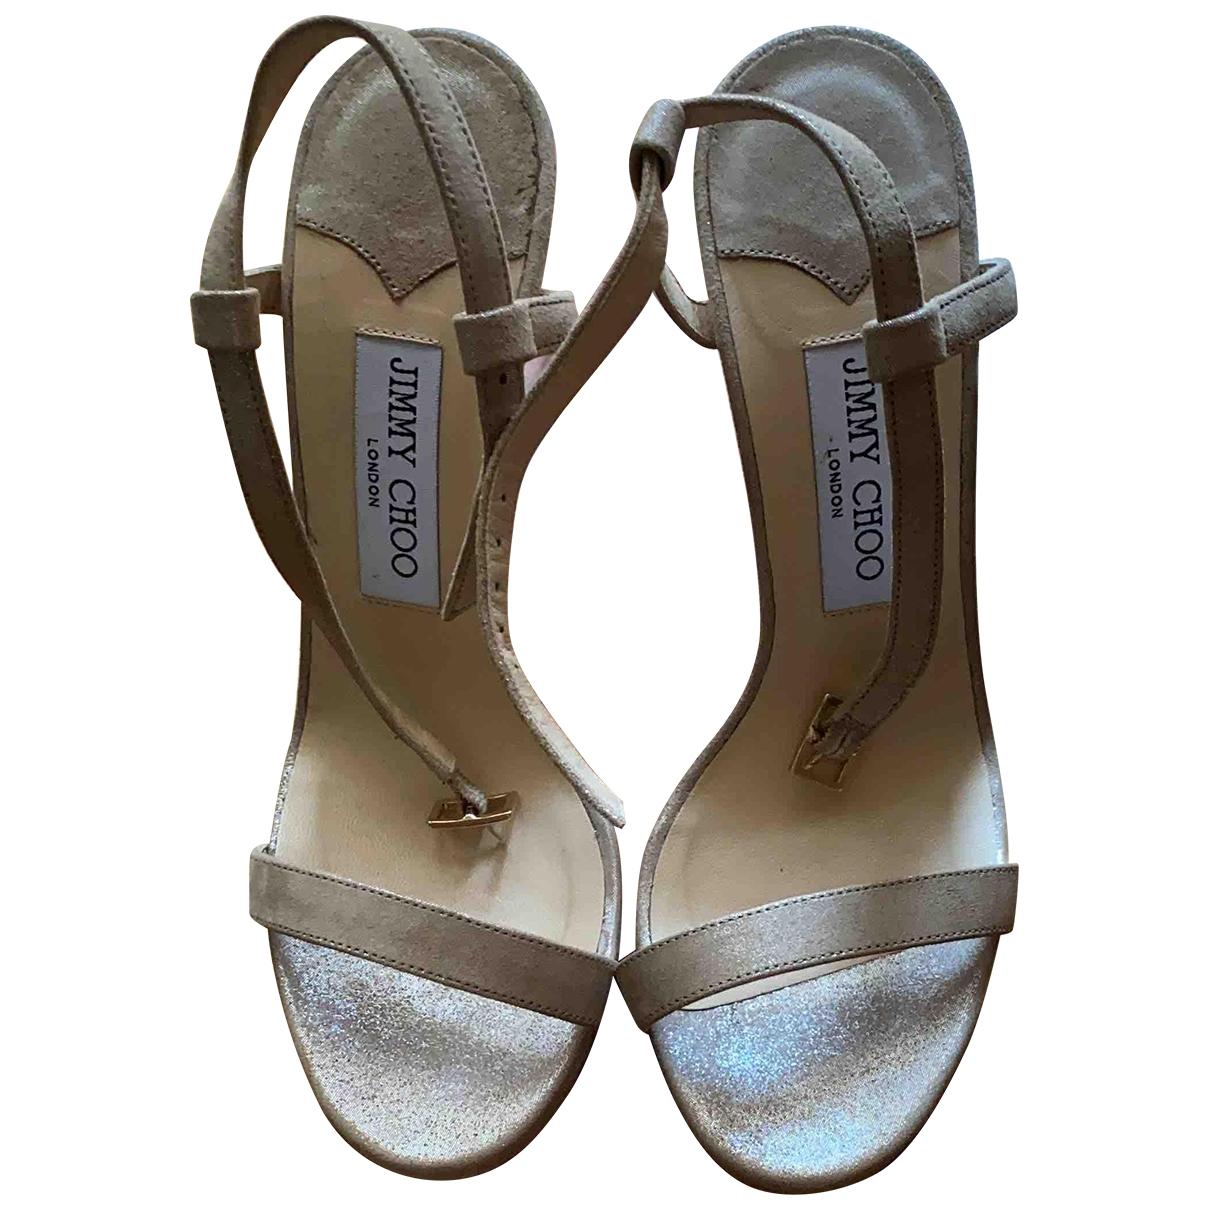 Jimmy Choo \N Gold Suede Sandals for Women 38 EU